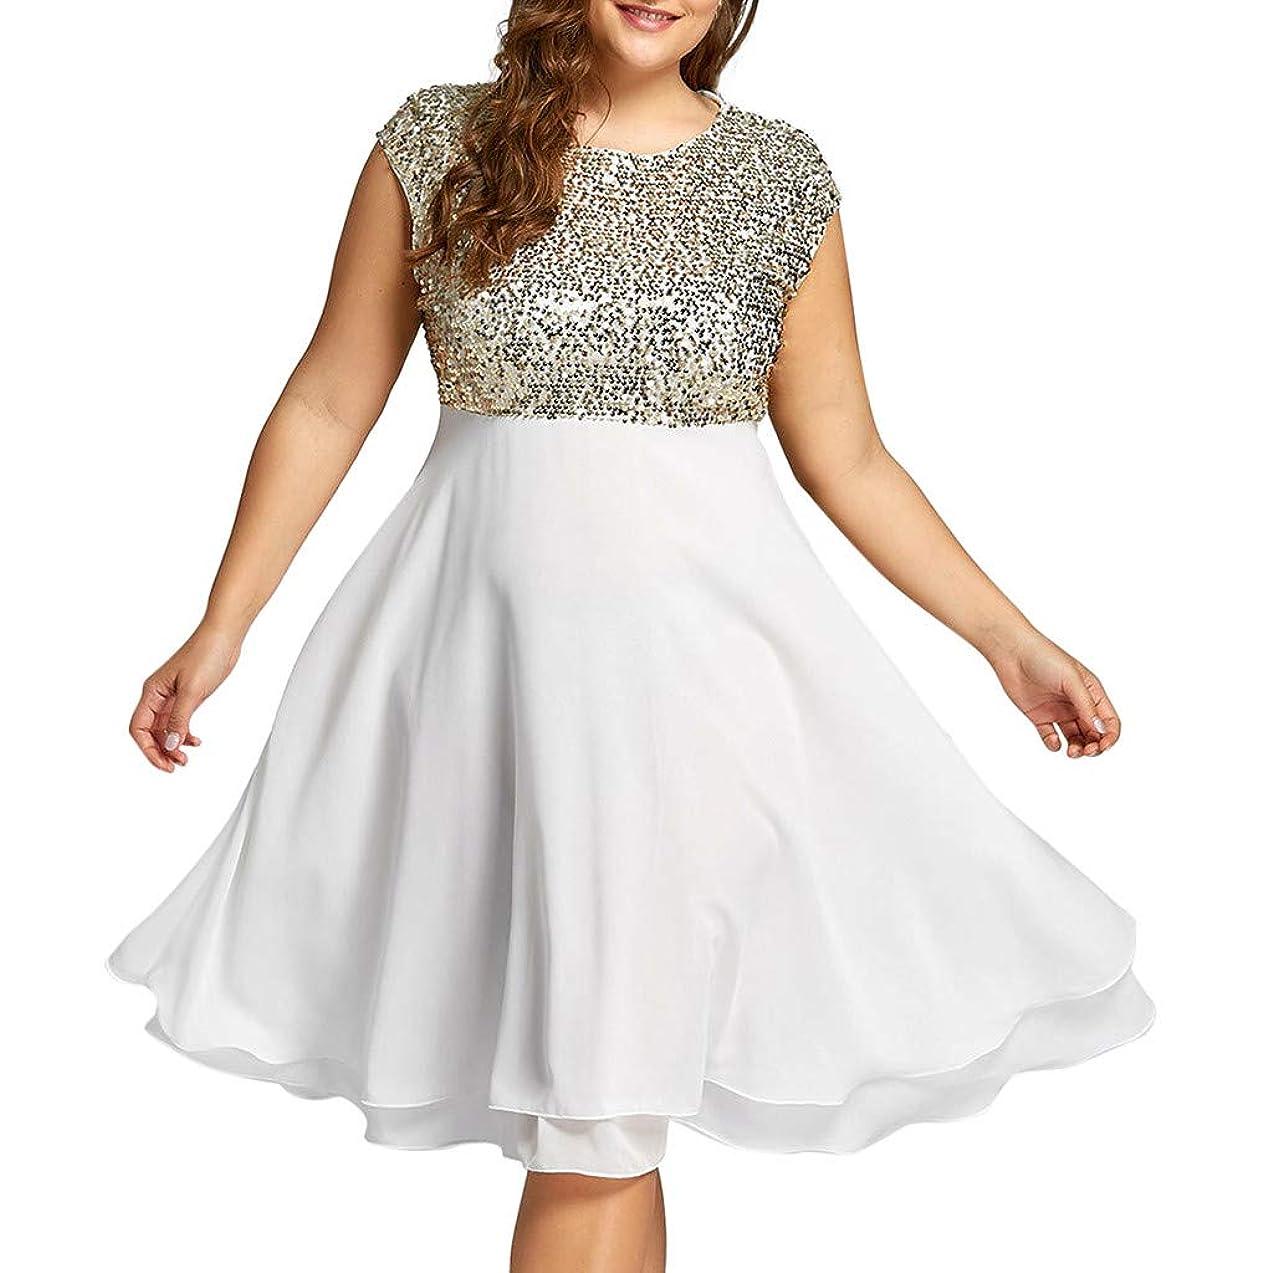 Goddessvan Plus Size Dresses for Women Casual O-Neck Sleeveless Zipper Chiffon Sequined Cocktail Dress